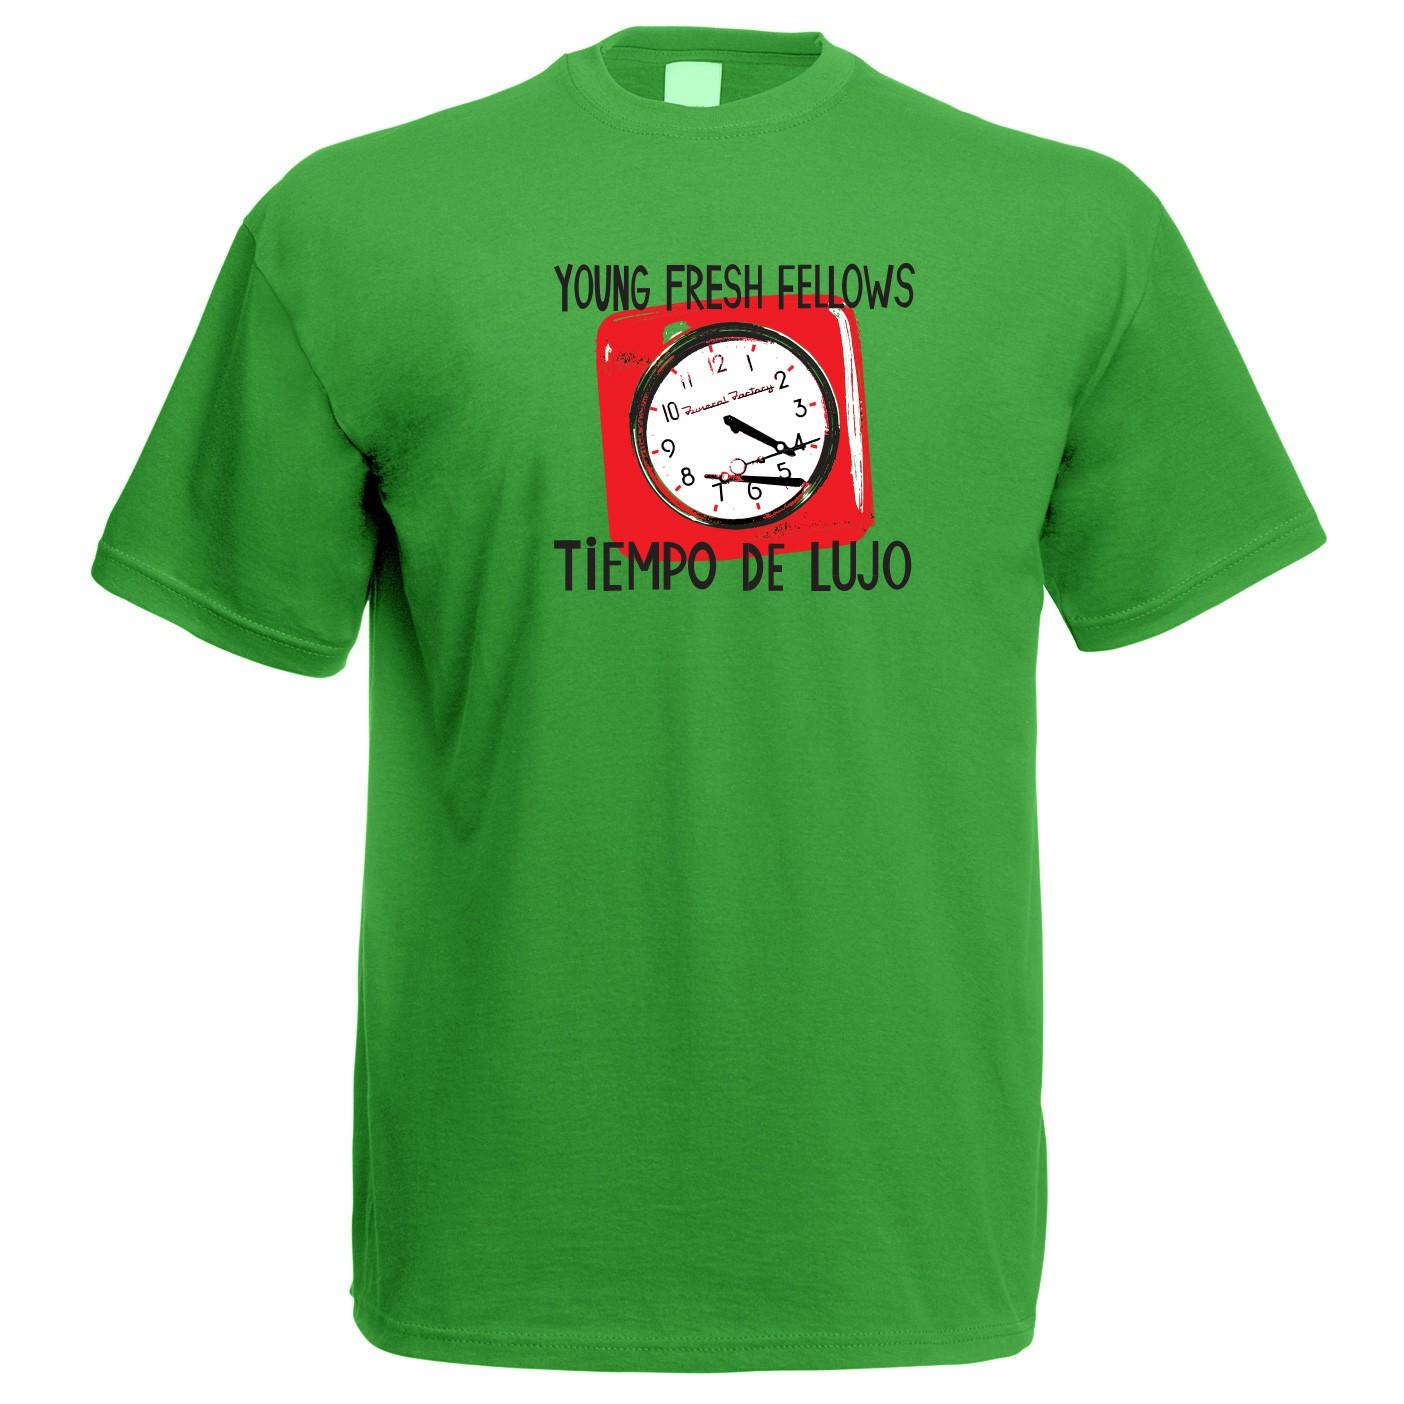 Young Fresh Fellows - Tiempo De Lujo - T-Shirt